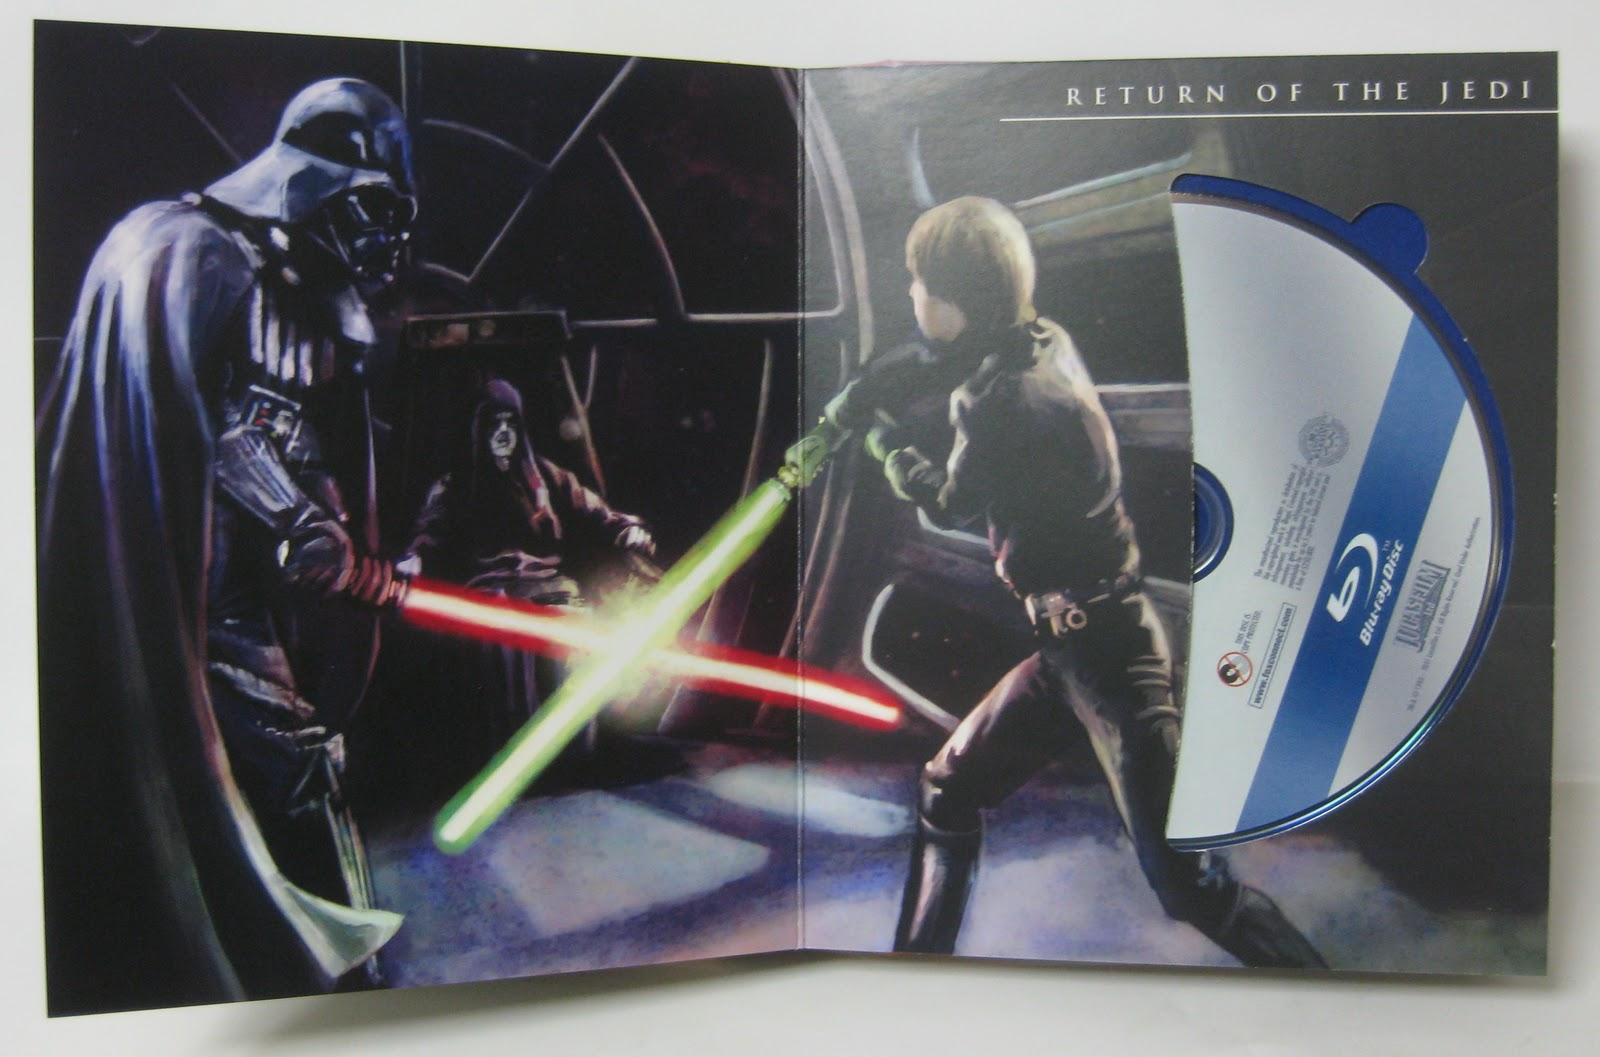 http://2.bp.blogspot.com/-P3mSZZltRSY/TrdXdlURCTI/AAAAAAAAFfY/HiJ7Oe94XOk/s1600/Star+Wars+Blu+Tytus+022.JPG